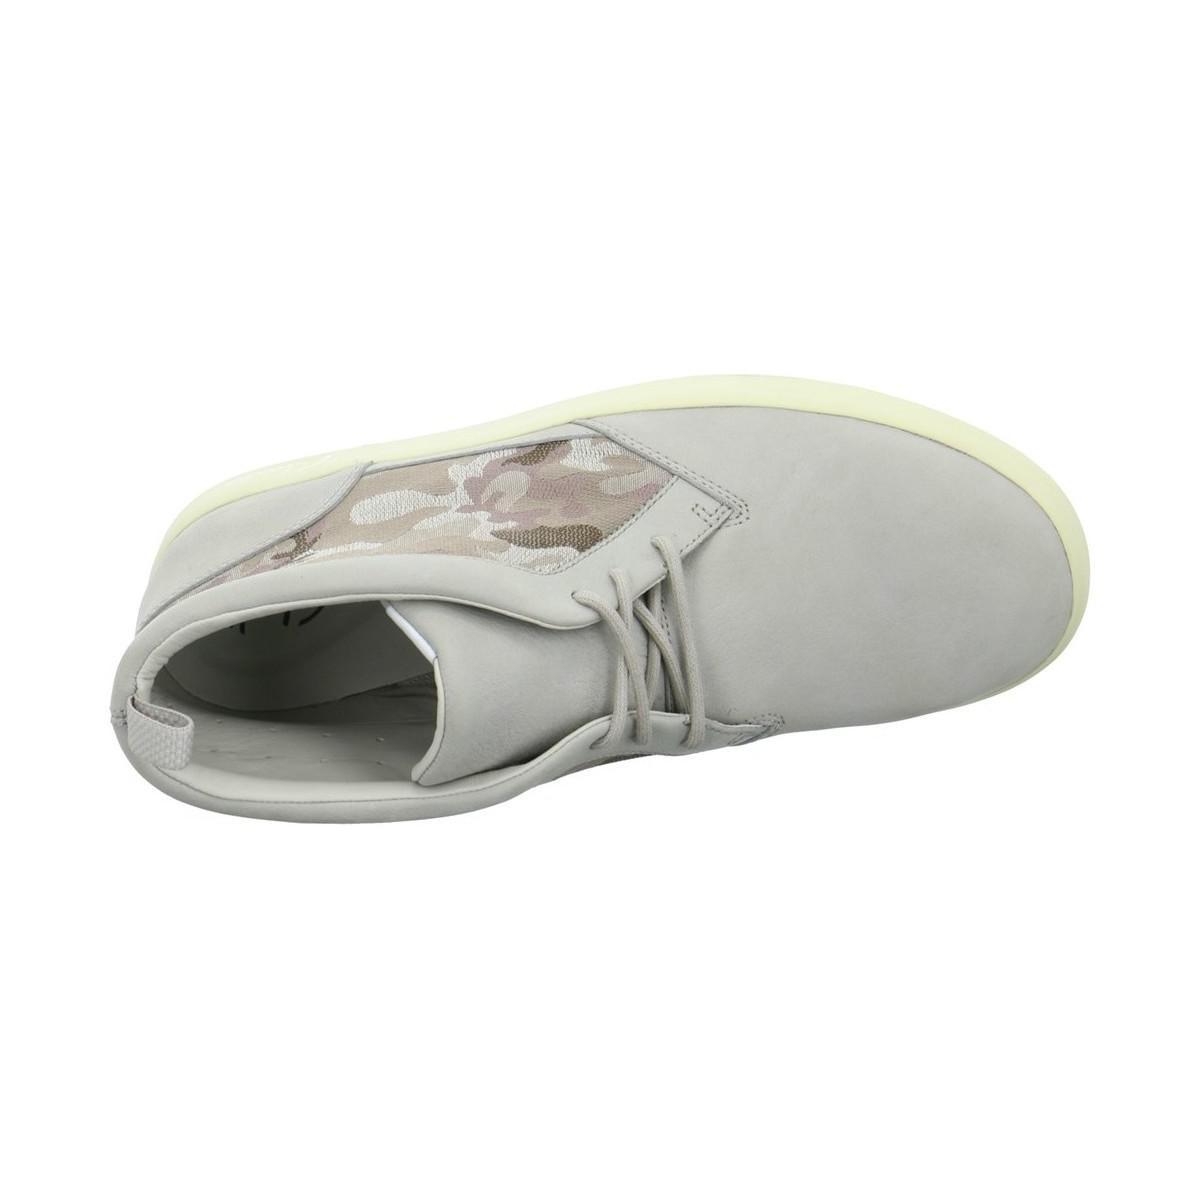 Clarks Tanner Sky Men's Shoes (high-top Trainers) In Grey in Grey for Men